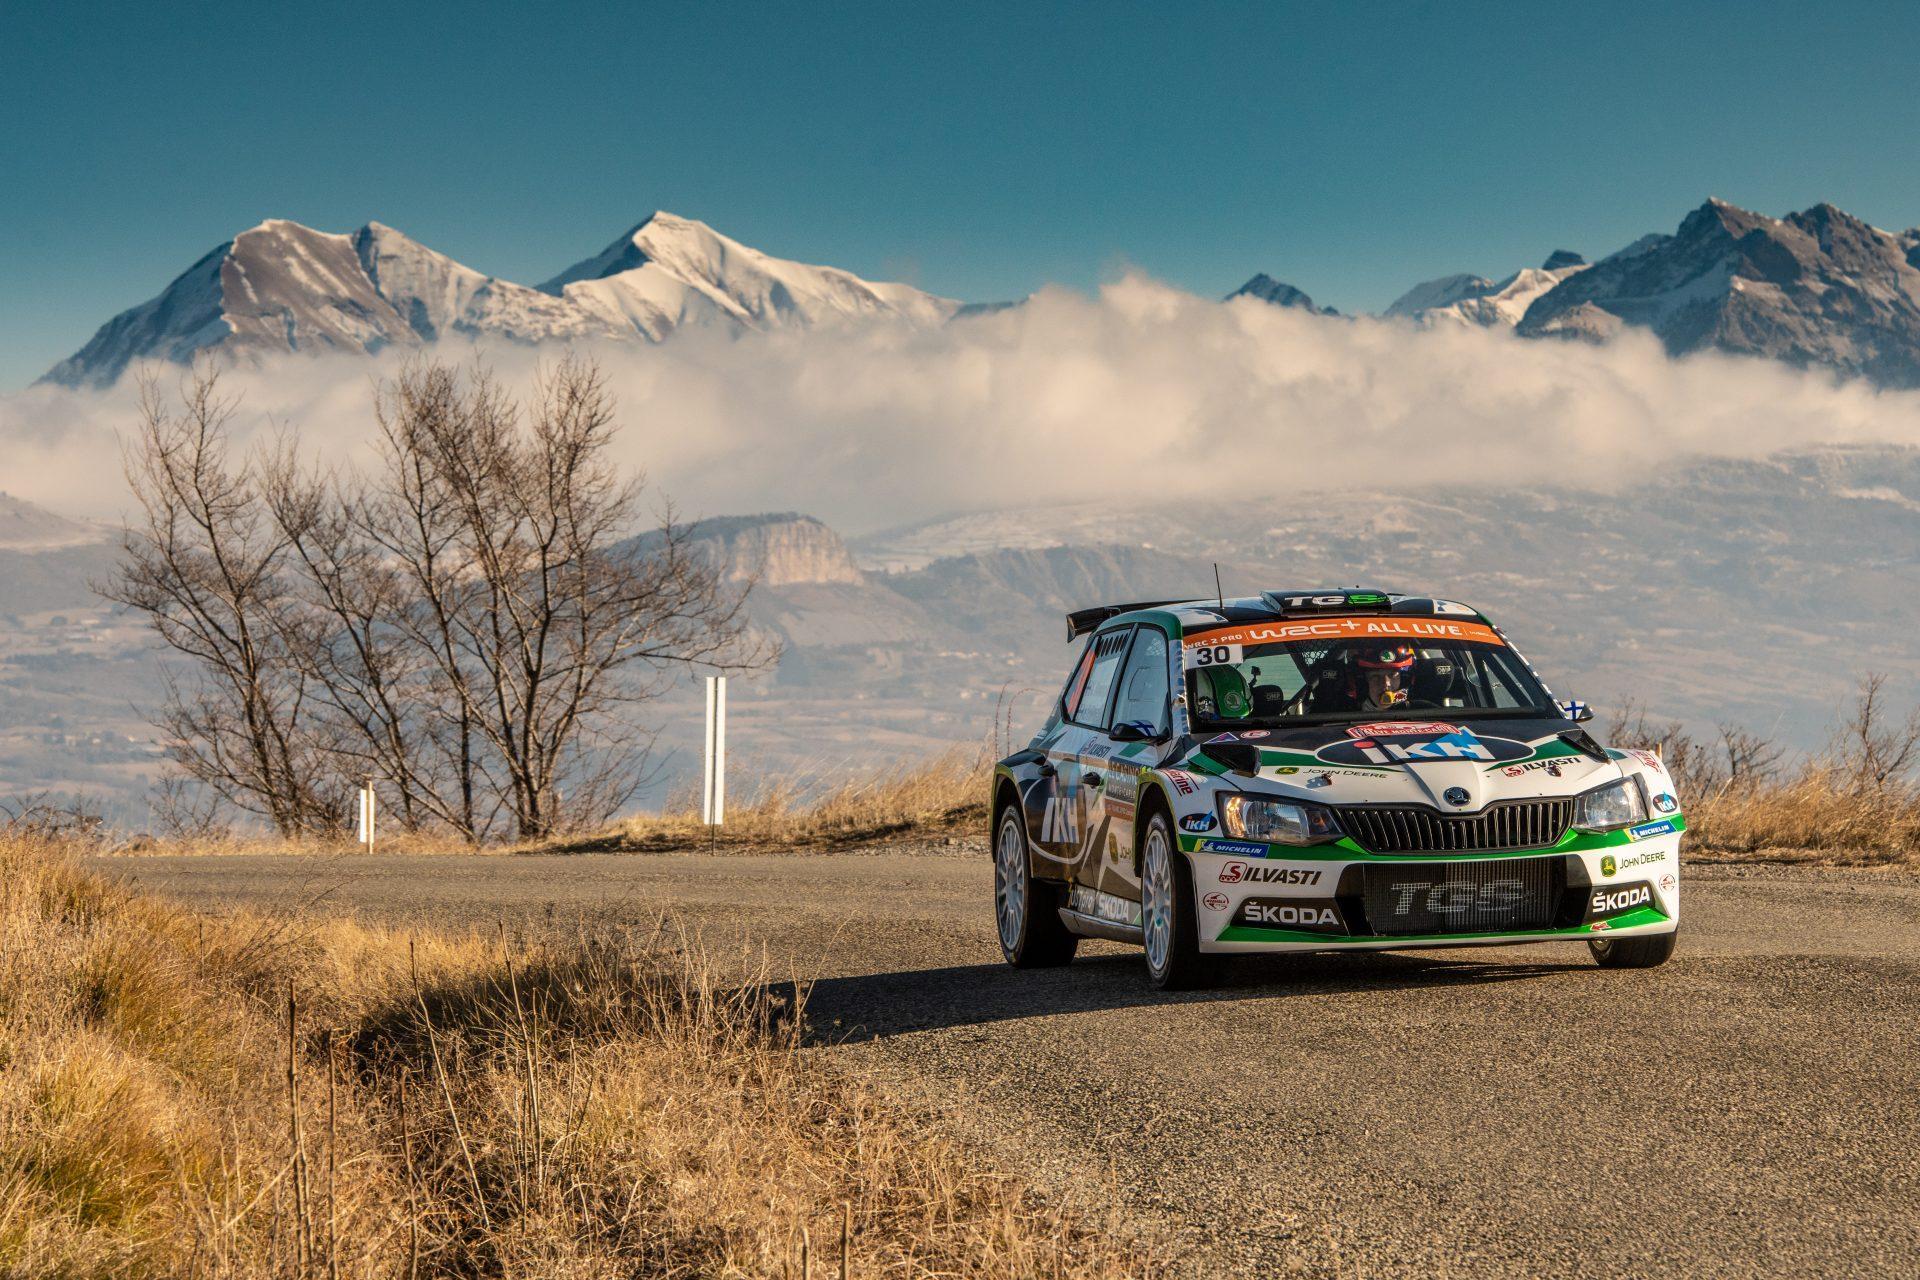 Rallye Monte Carlo 2019: Průběžné výsledky a novinky